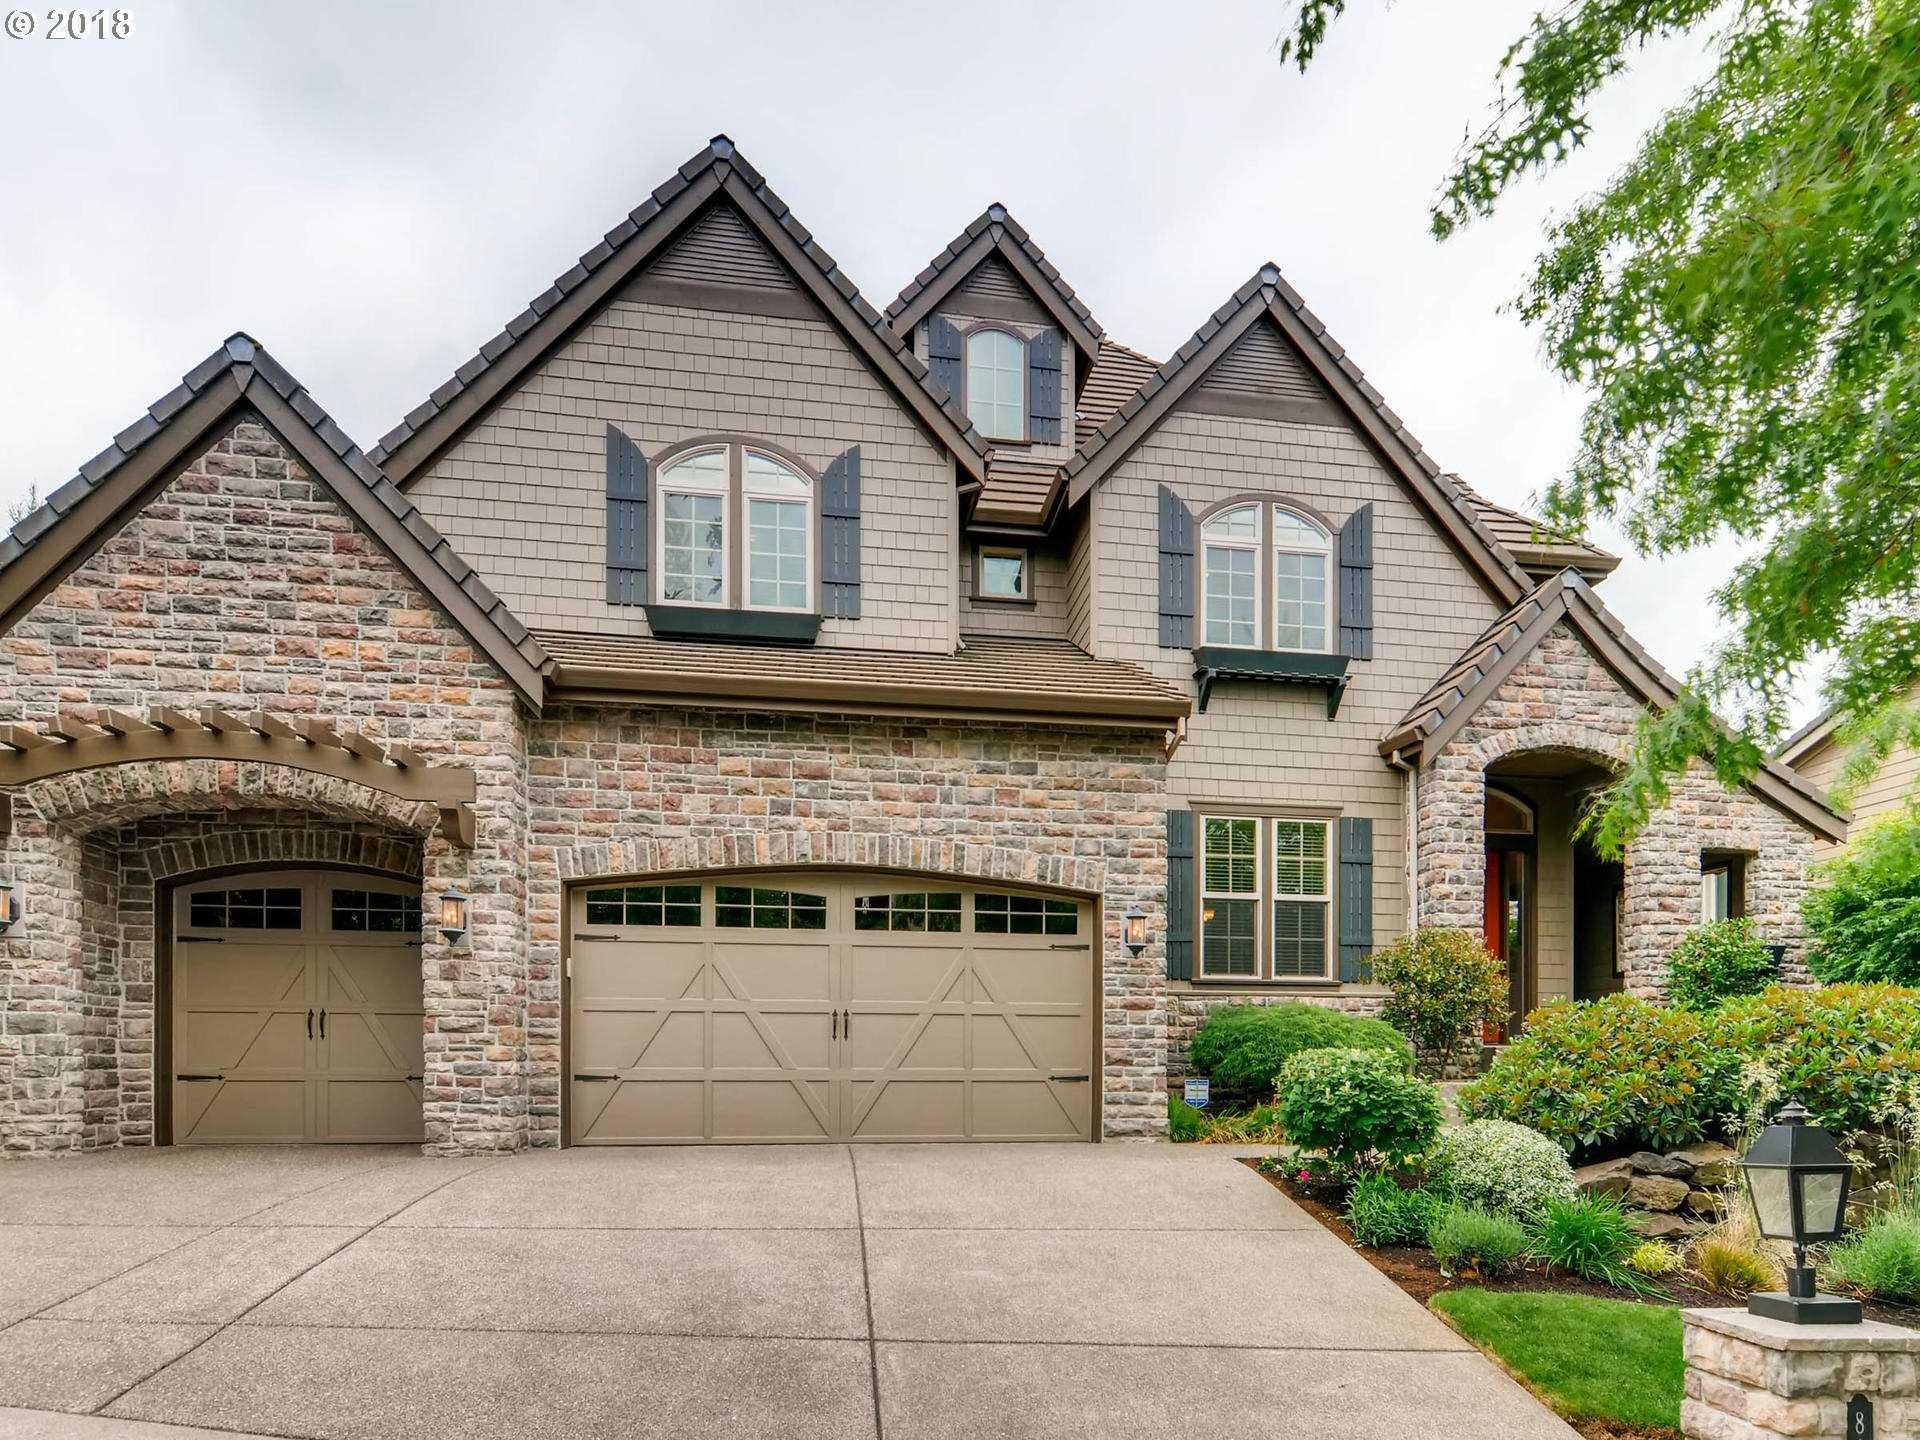 $865,000 - 4Br/5Ba -  for Sale in Beaverton